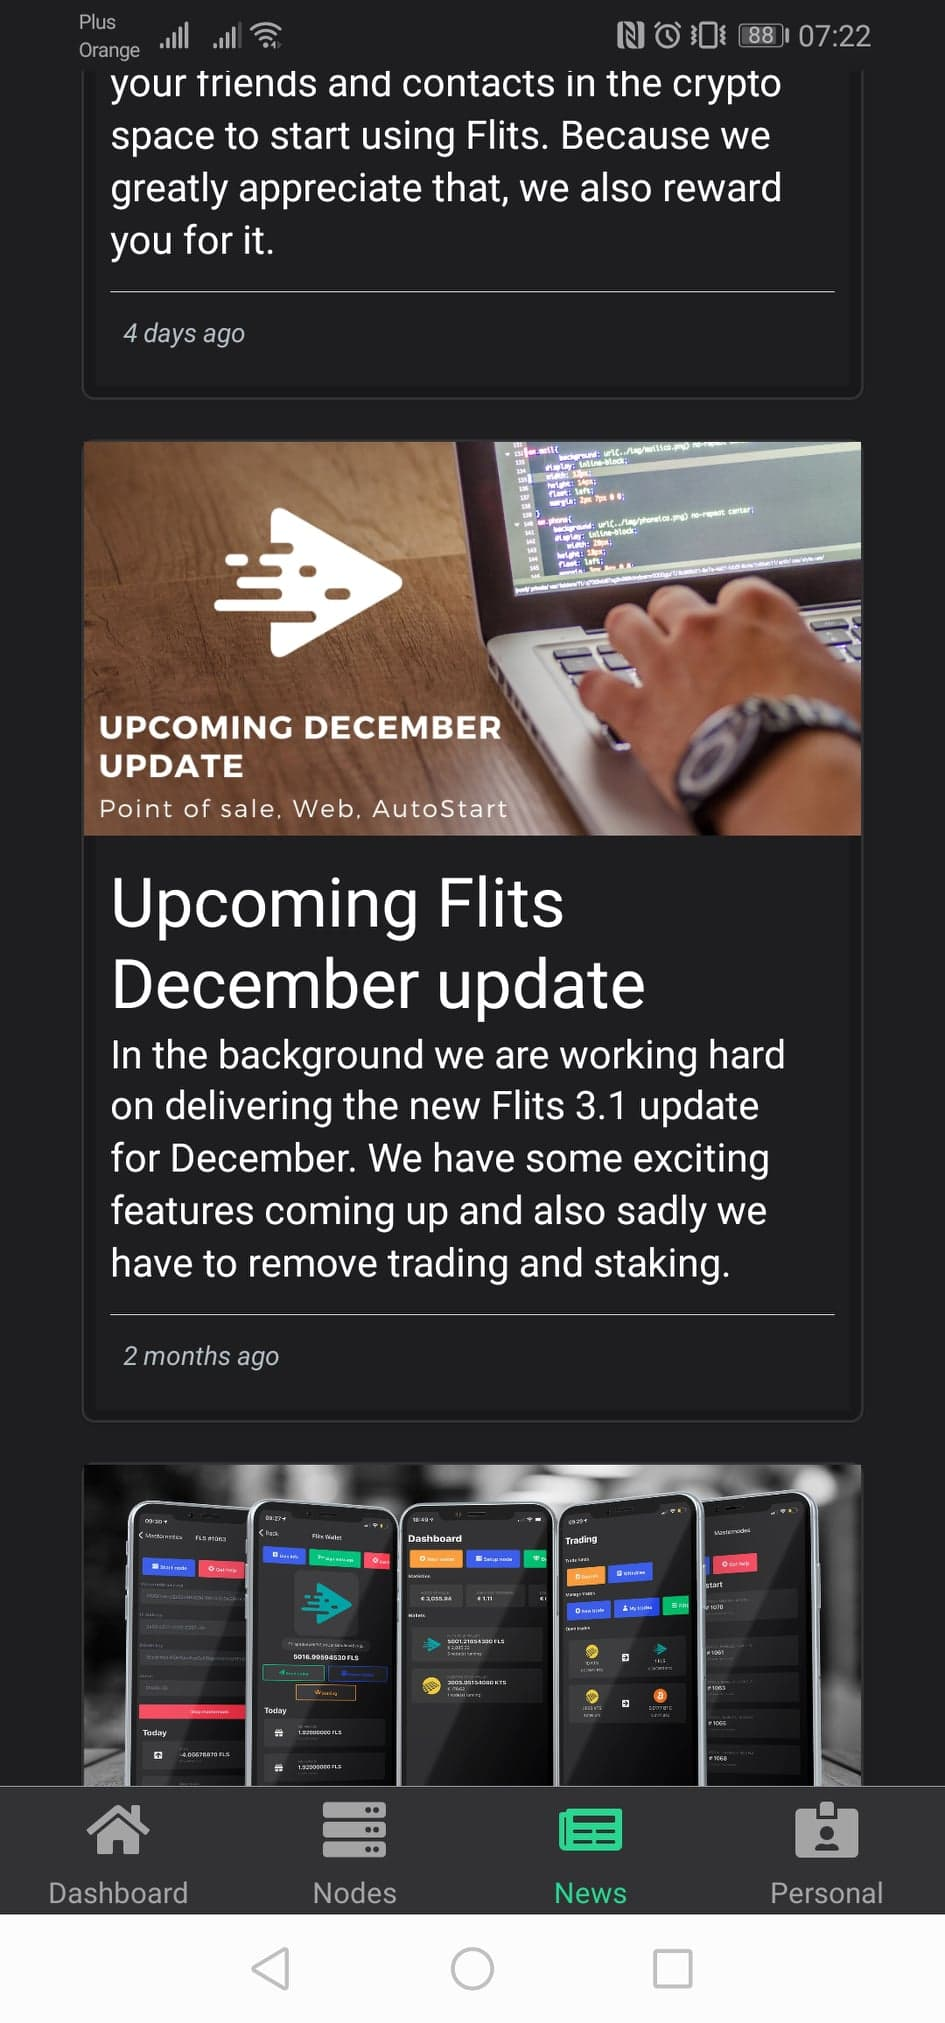 FLITS masternode 13